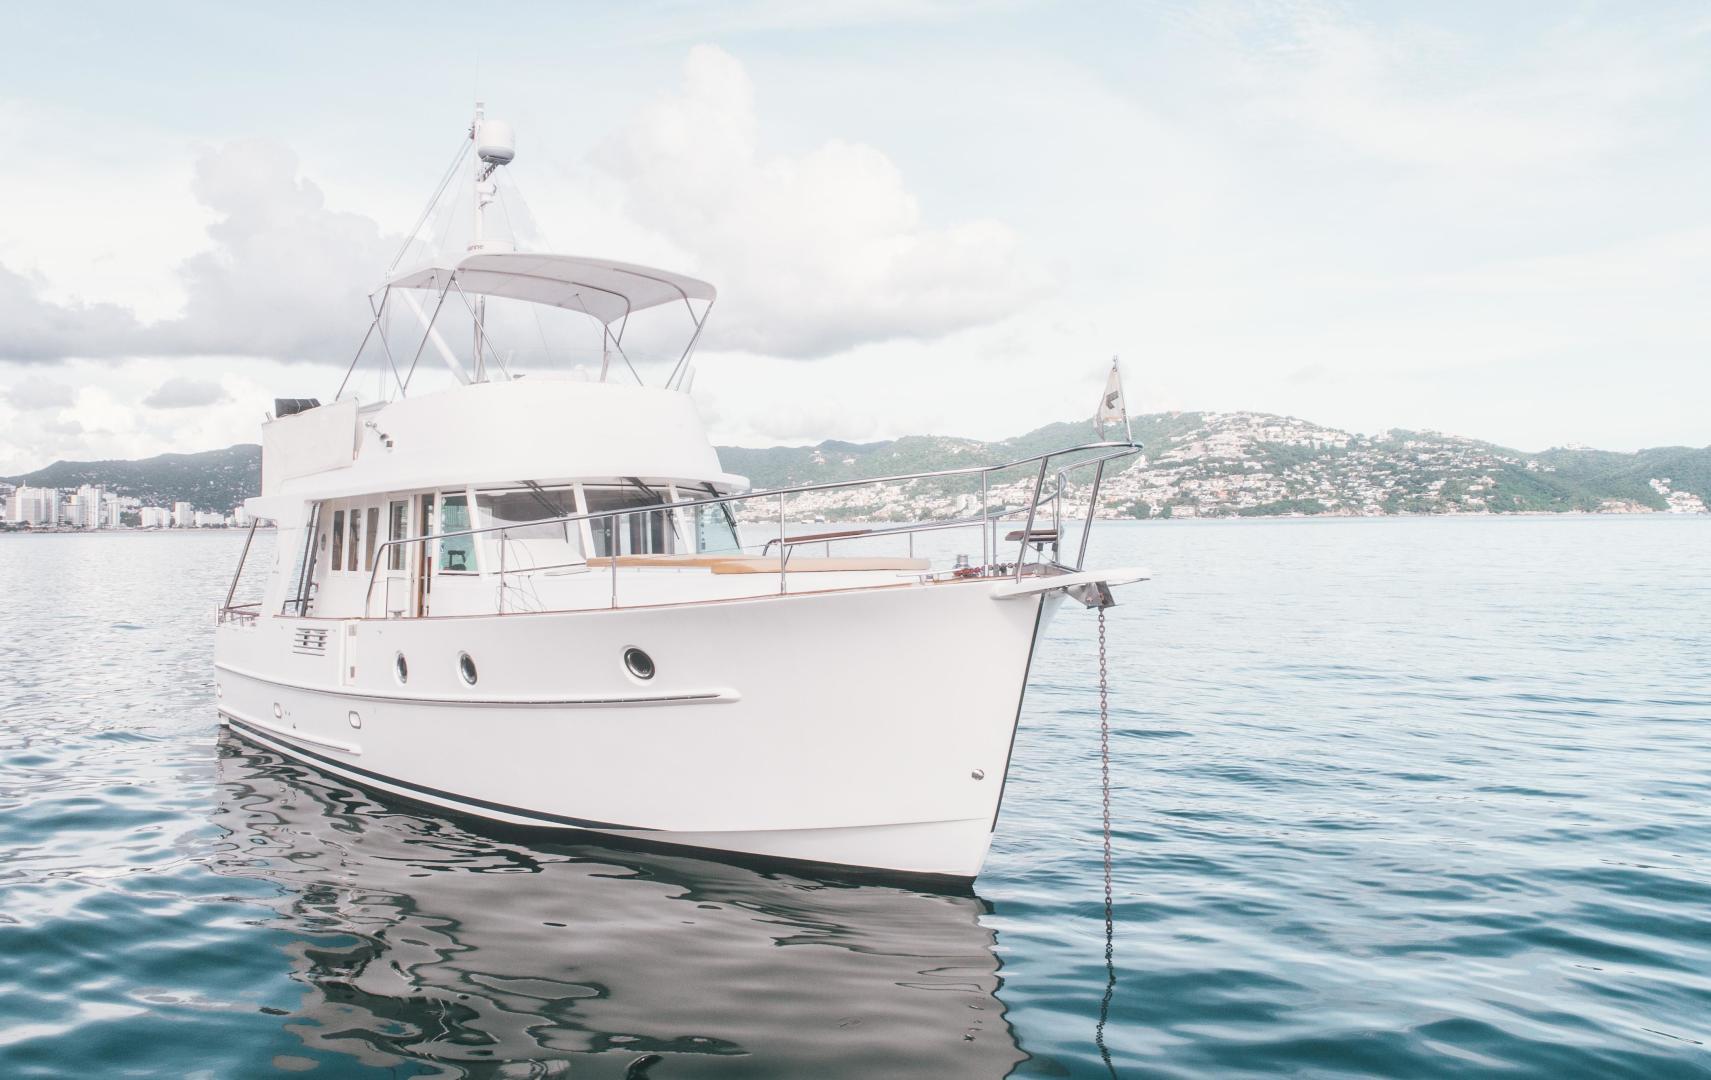 Beneteau-Swift Trawler 2008-Amadeus Acapulco-Mexico-1487014 | Thumbnail